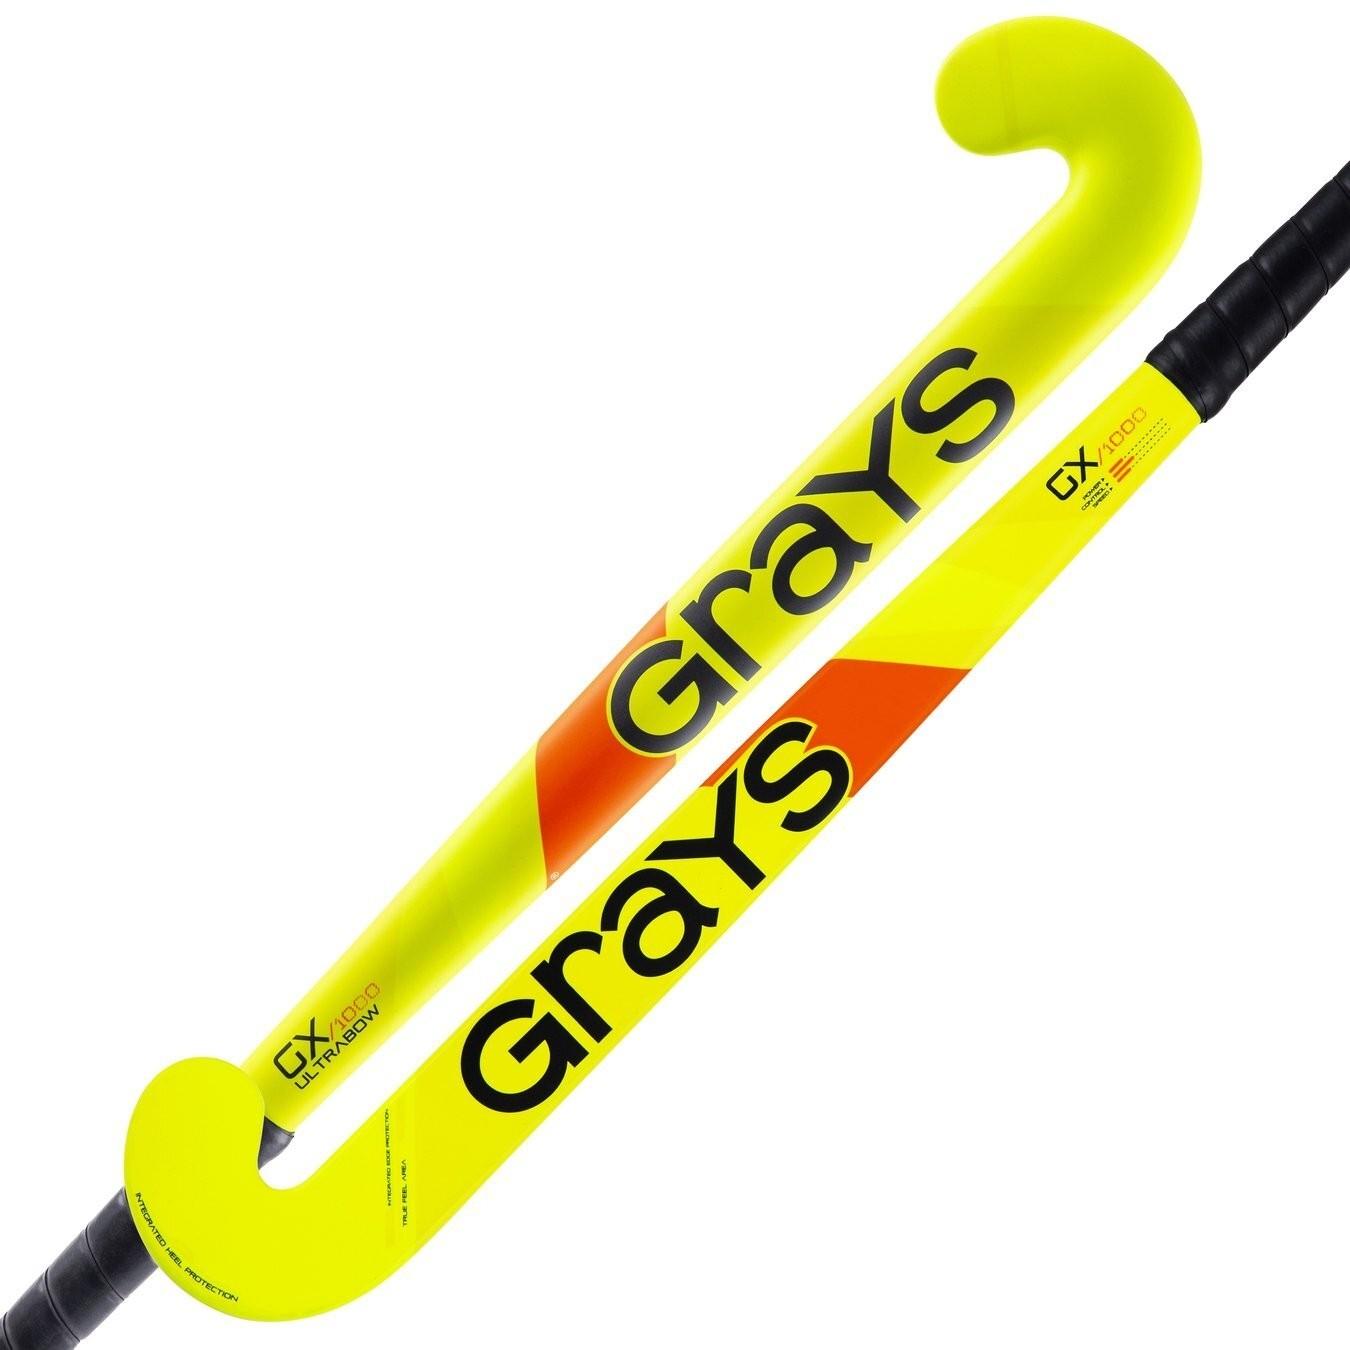 2021/22 Grays GX 1000 Ultrabow Hockey Stick - Fluo Yellow